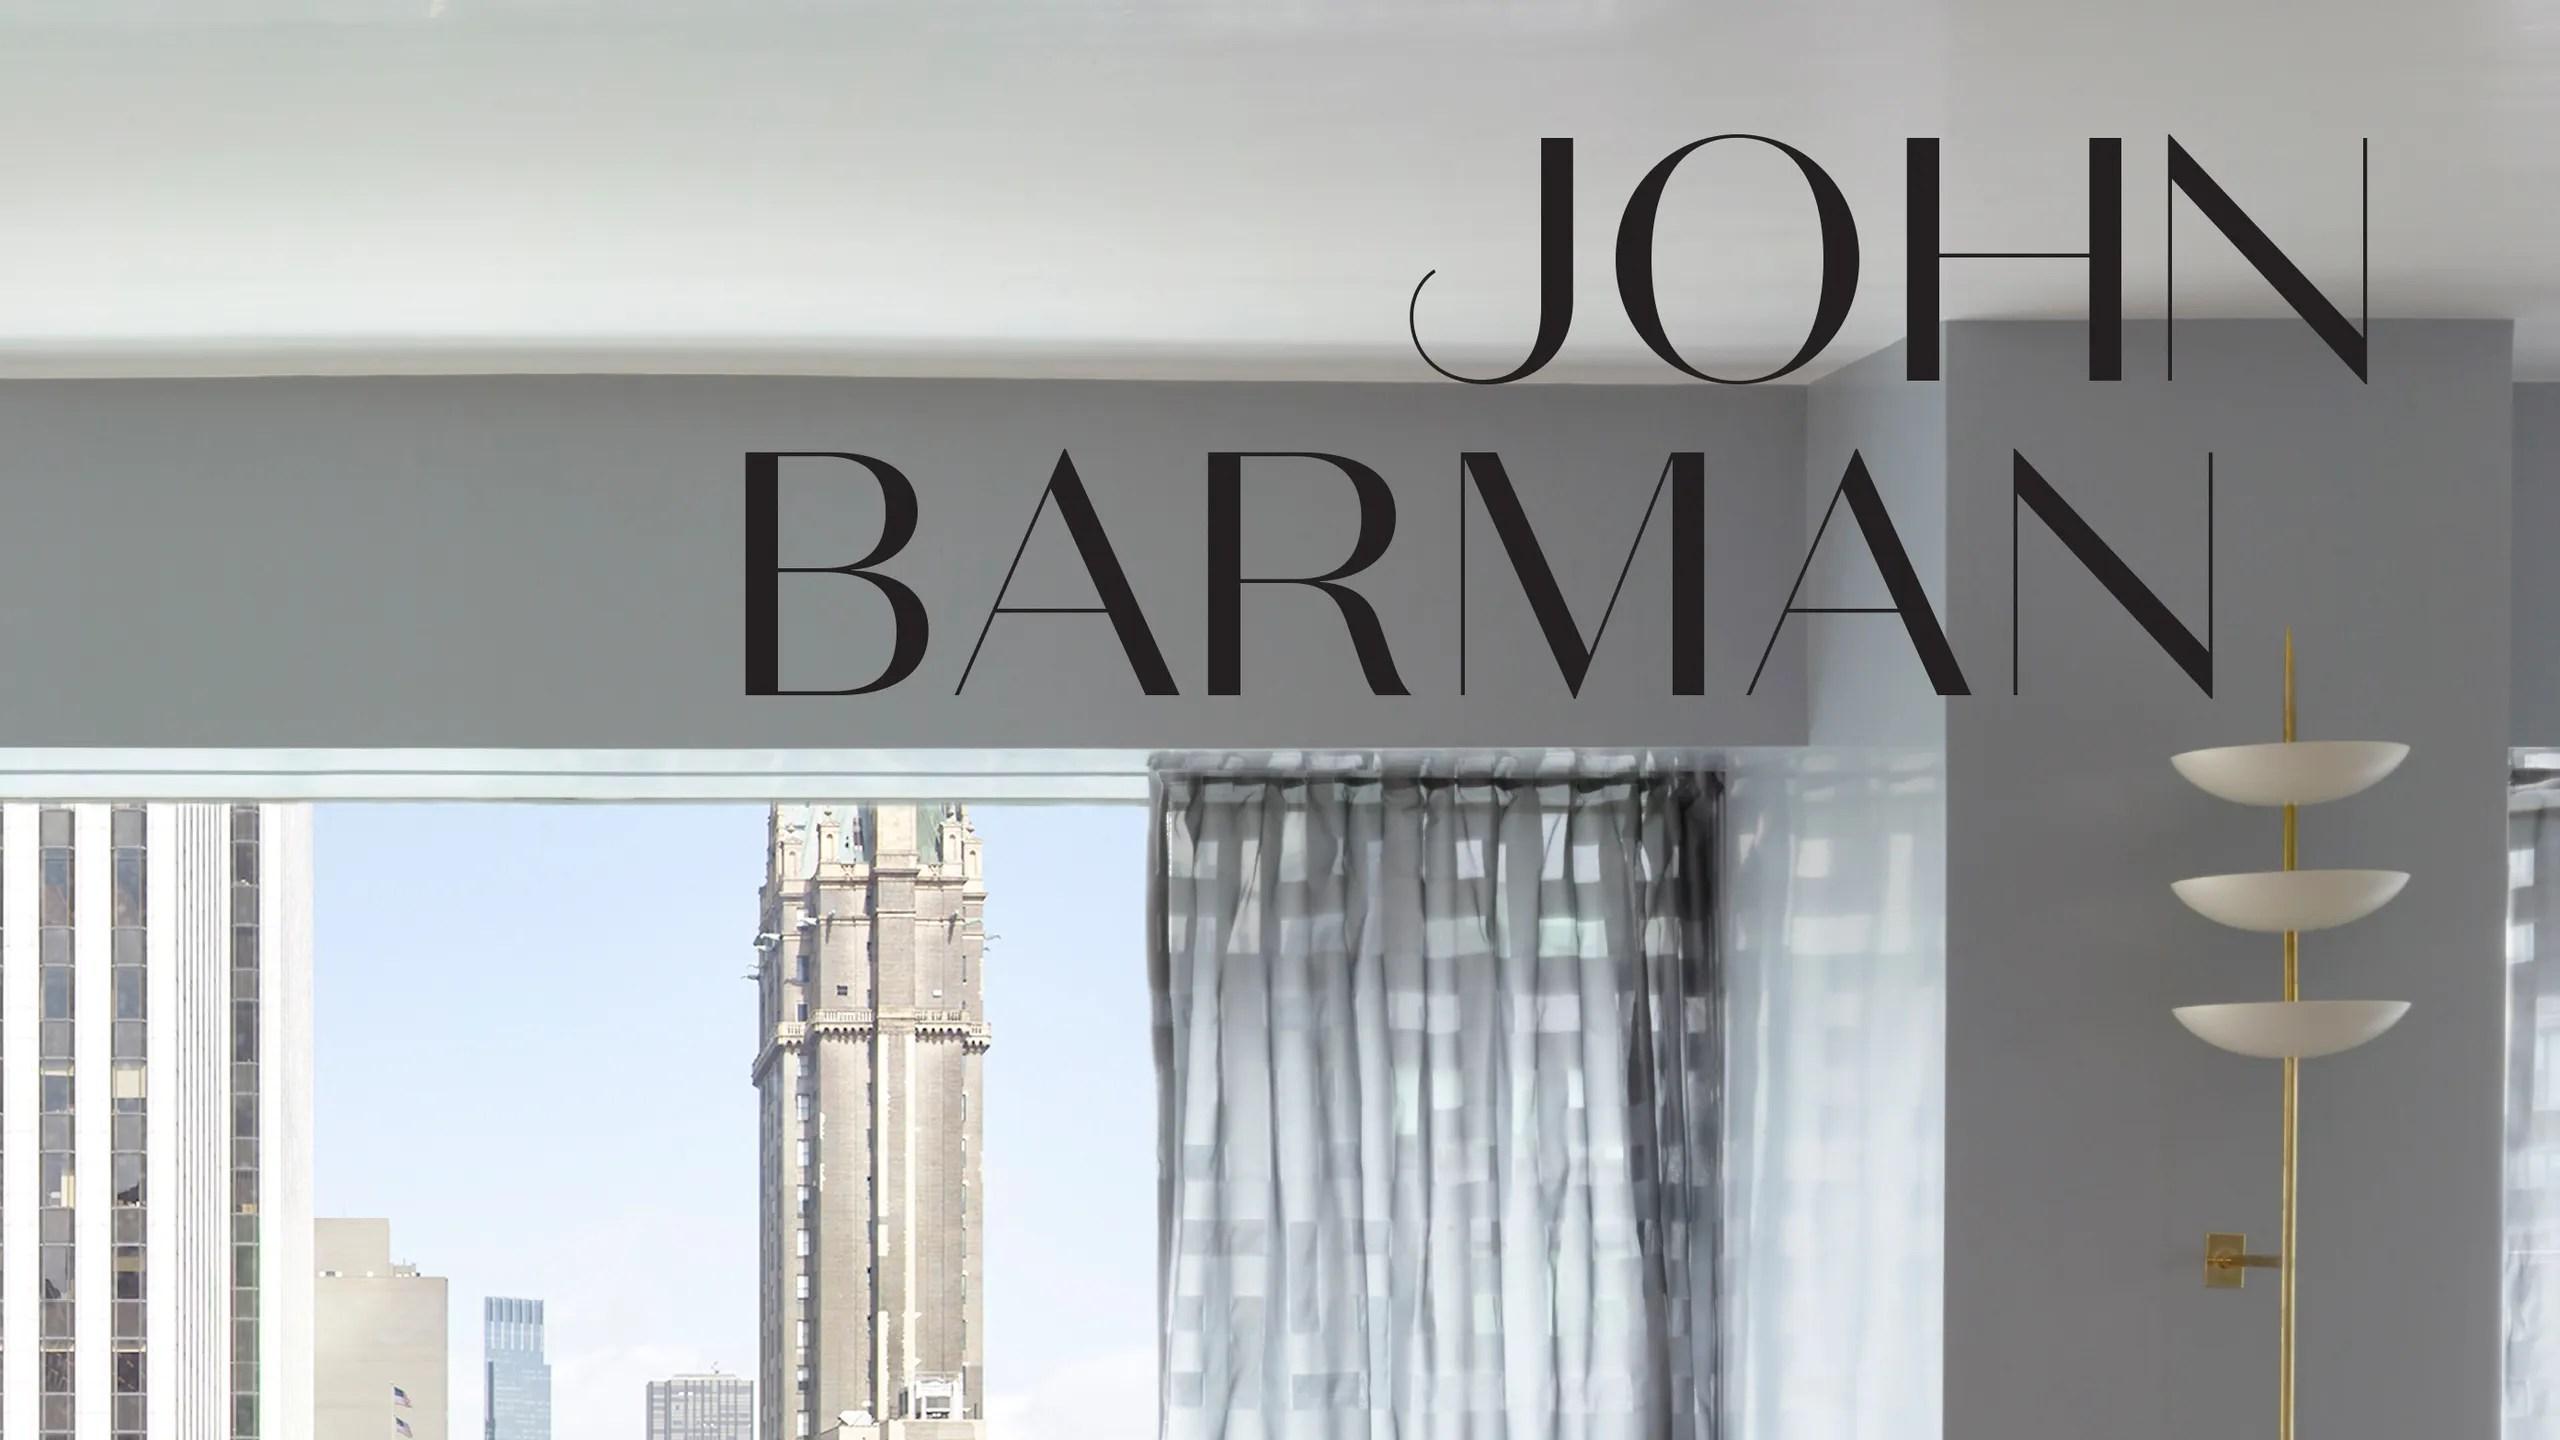 John Barman Interior Design Book Architectural Digest